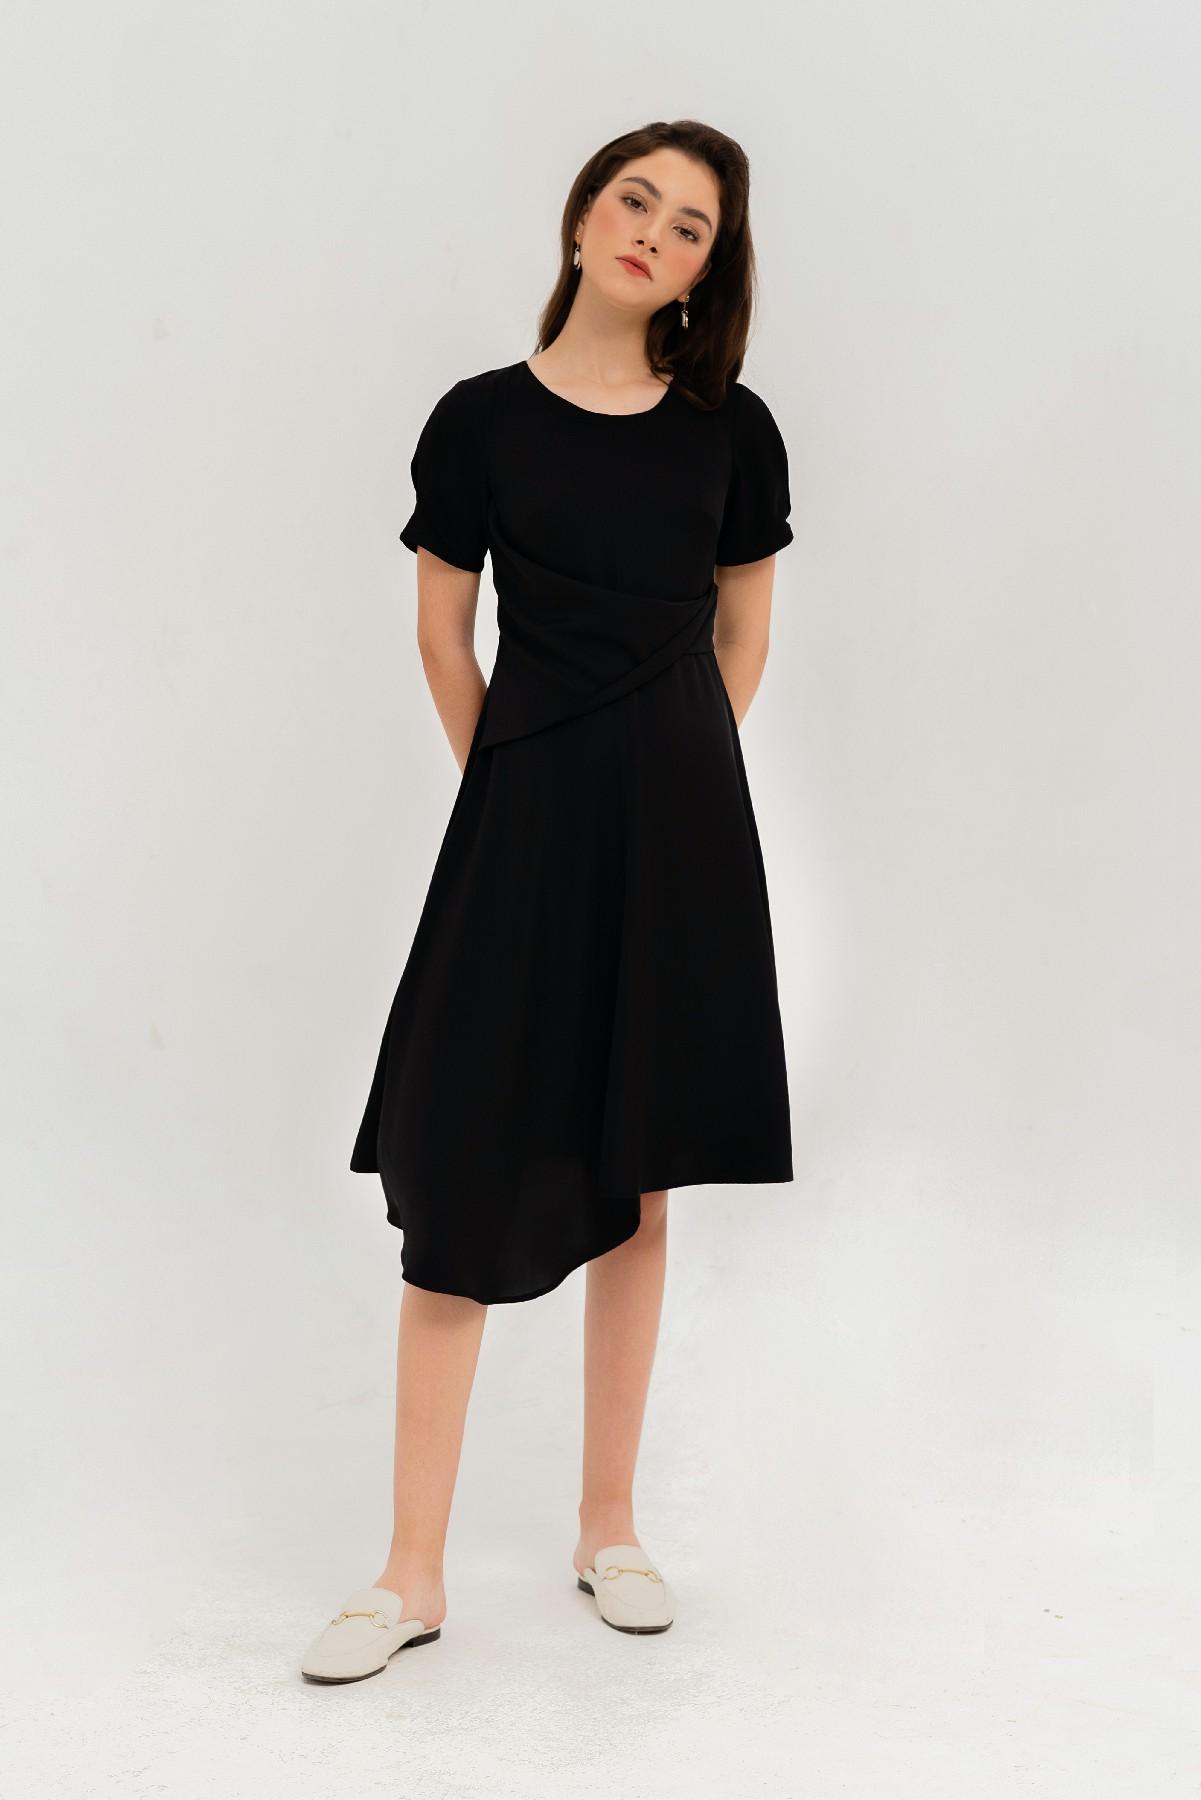 Đầm đen xoắn eo tay ngắn  1